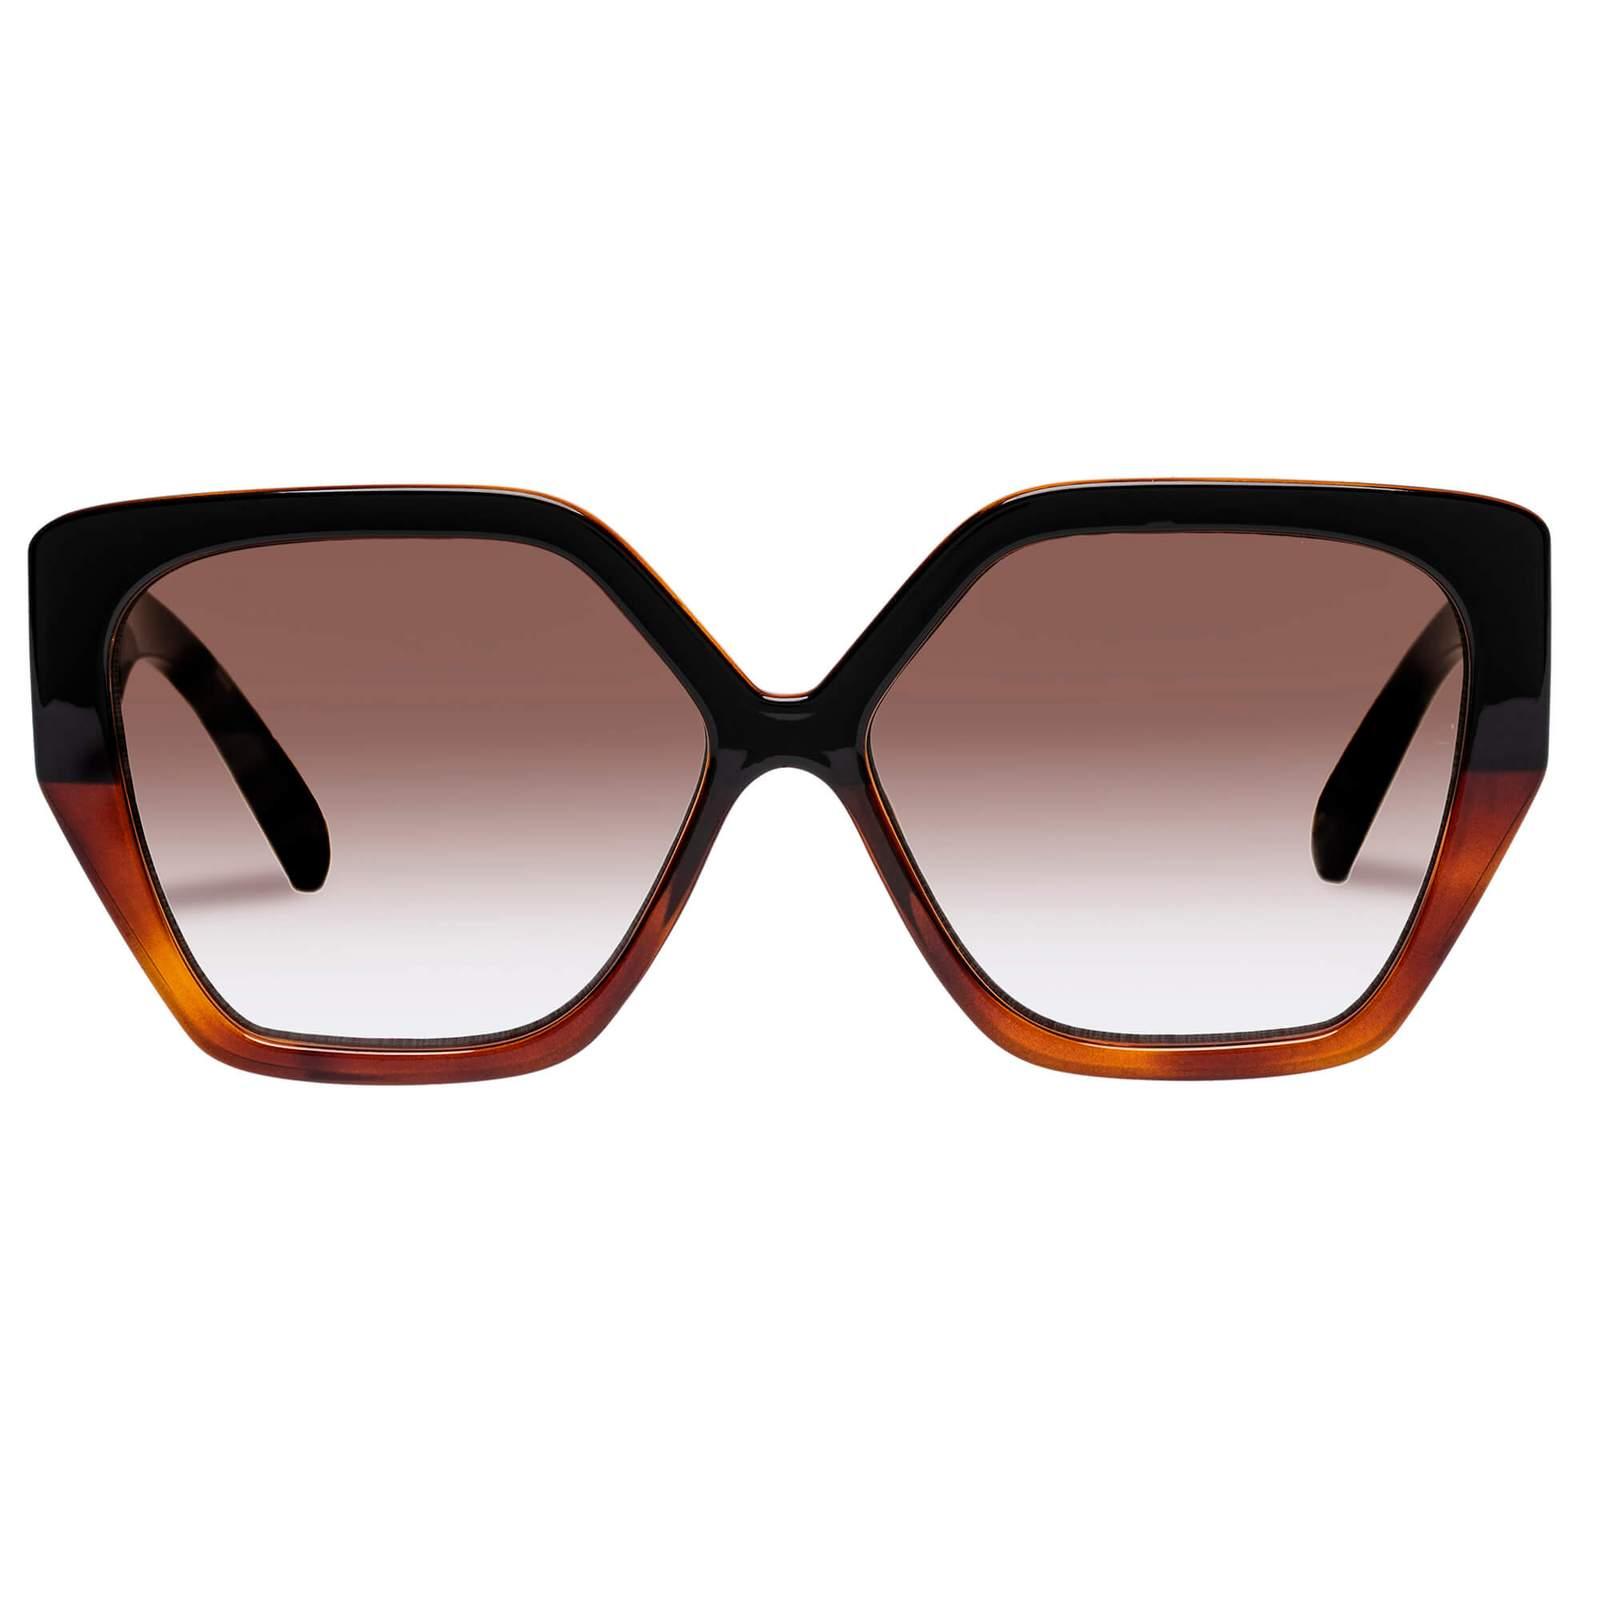 Le Specs- So Fetch- Black Tort